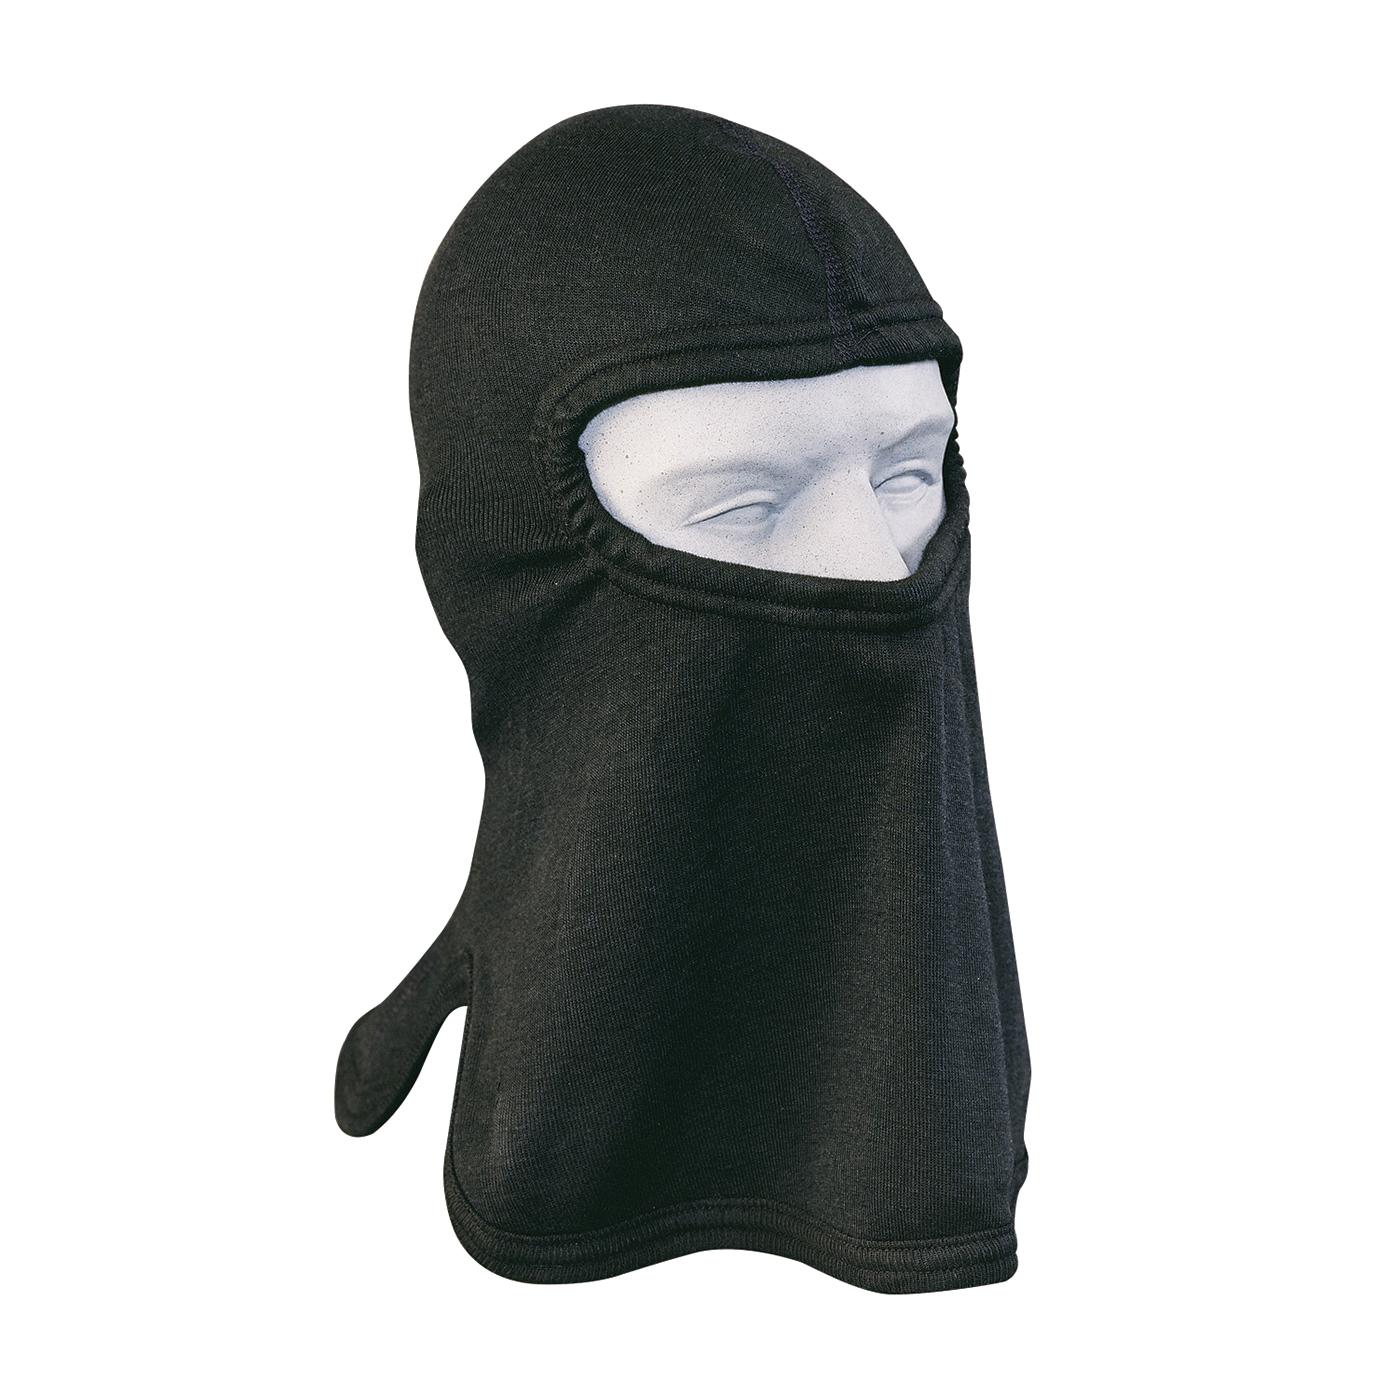 PIP® 906-8416CT Single Layer Fire Resistant Hood With Bib, Universal, Black, 17 in L, 84% Carbon/16% Technora®, 7 oz Fabric, Tri-Cut Full Face Closure